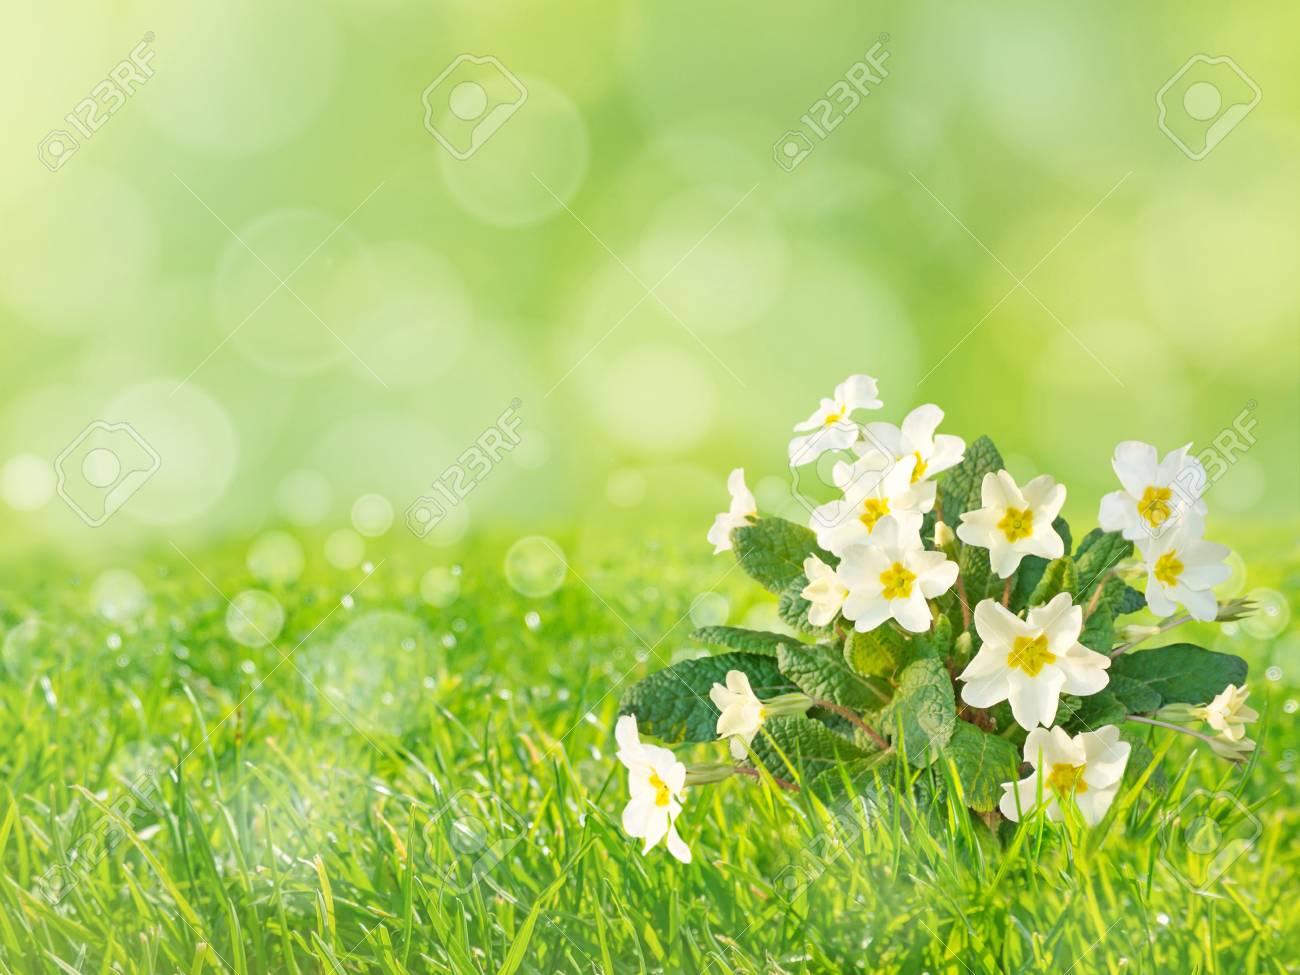 Primrose or primula vulgaris pale yellow flowers on the spring primrose or primula vulgaris pale yellow flowers on the spring blurred grass lawn background stock photo mightylinksfo